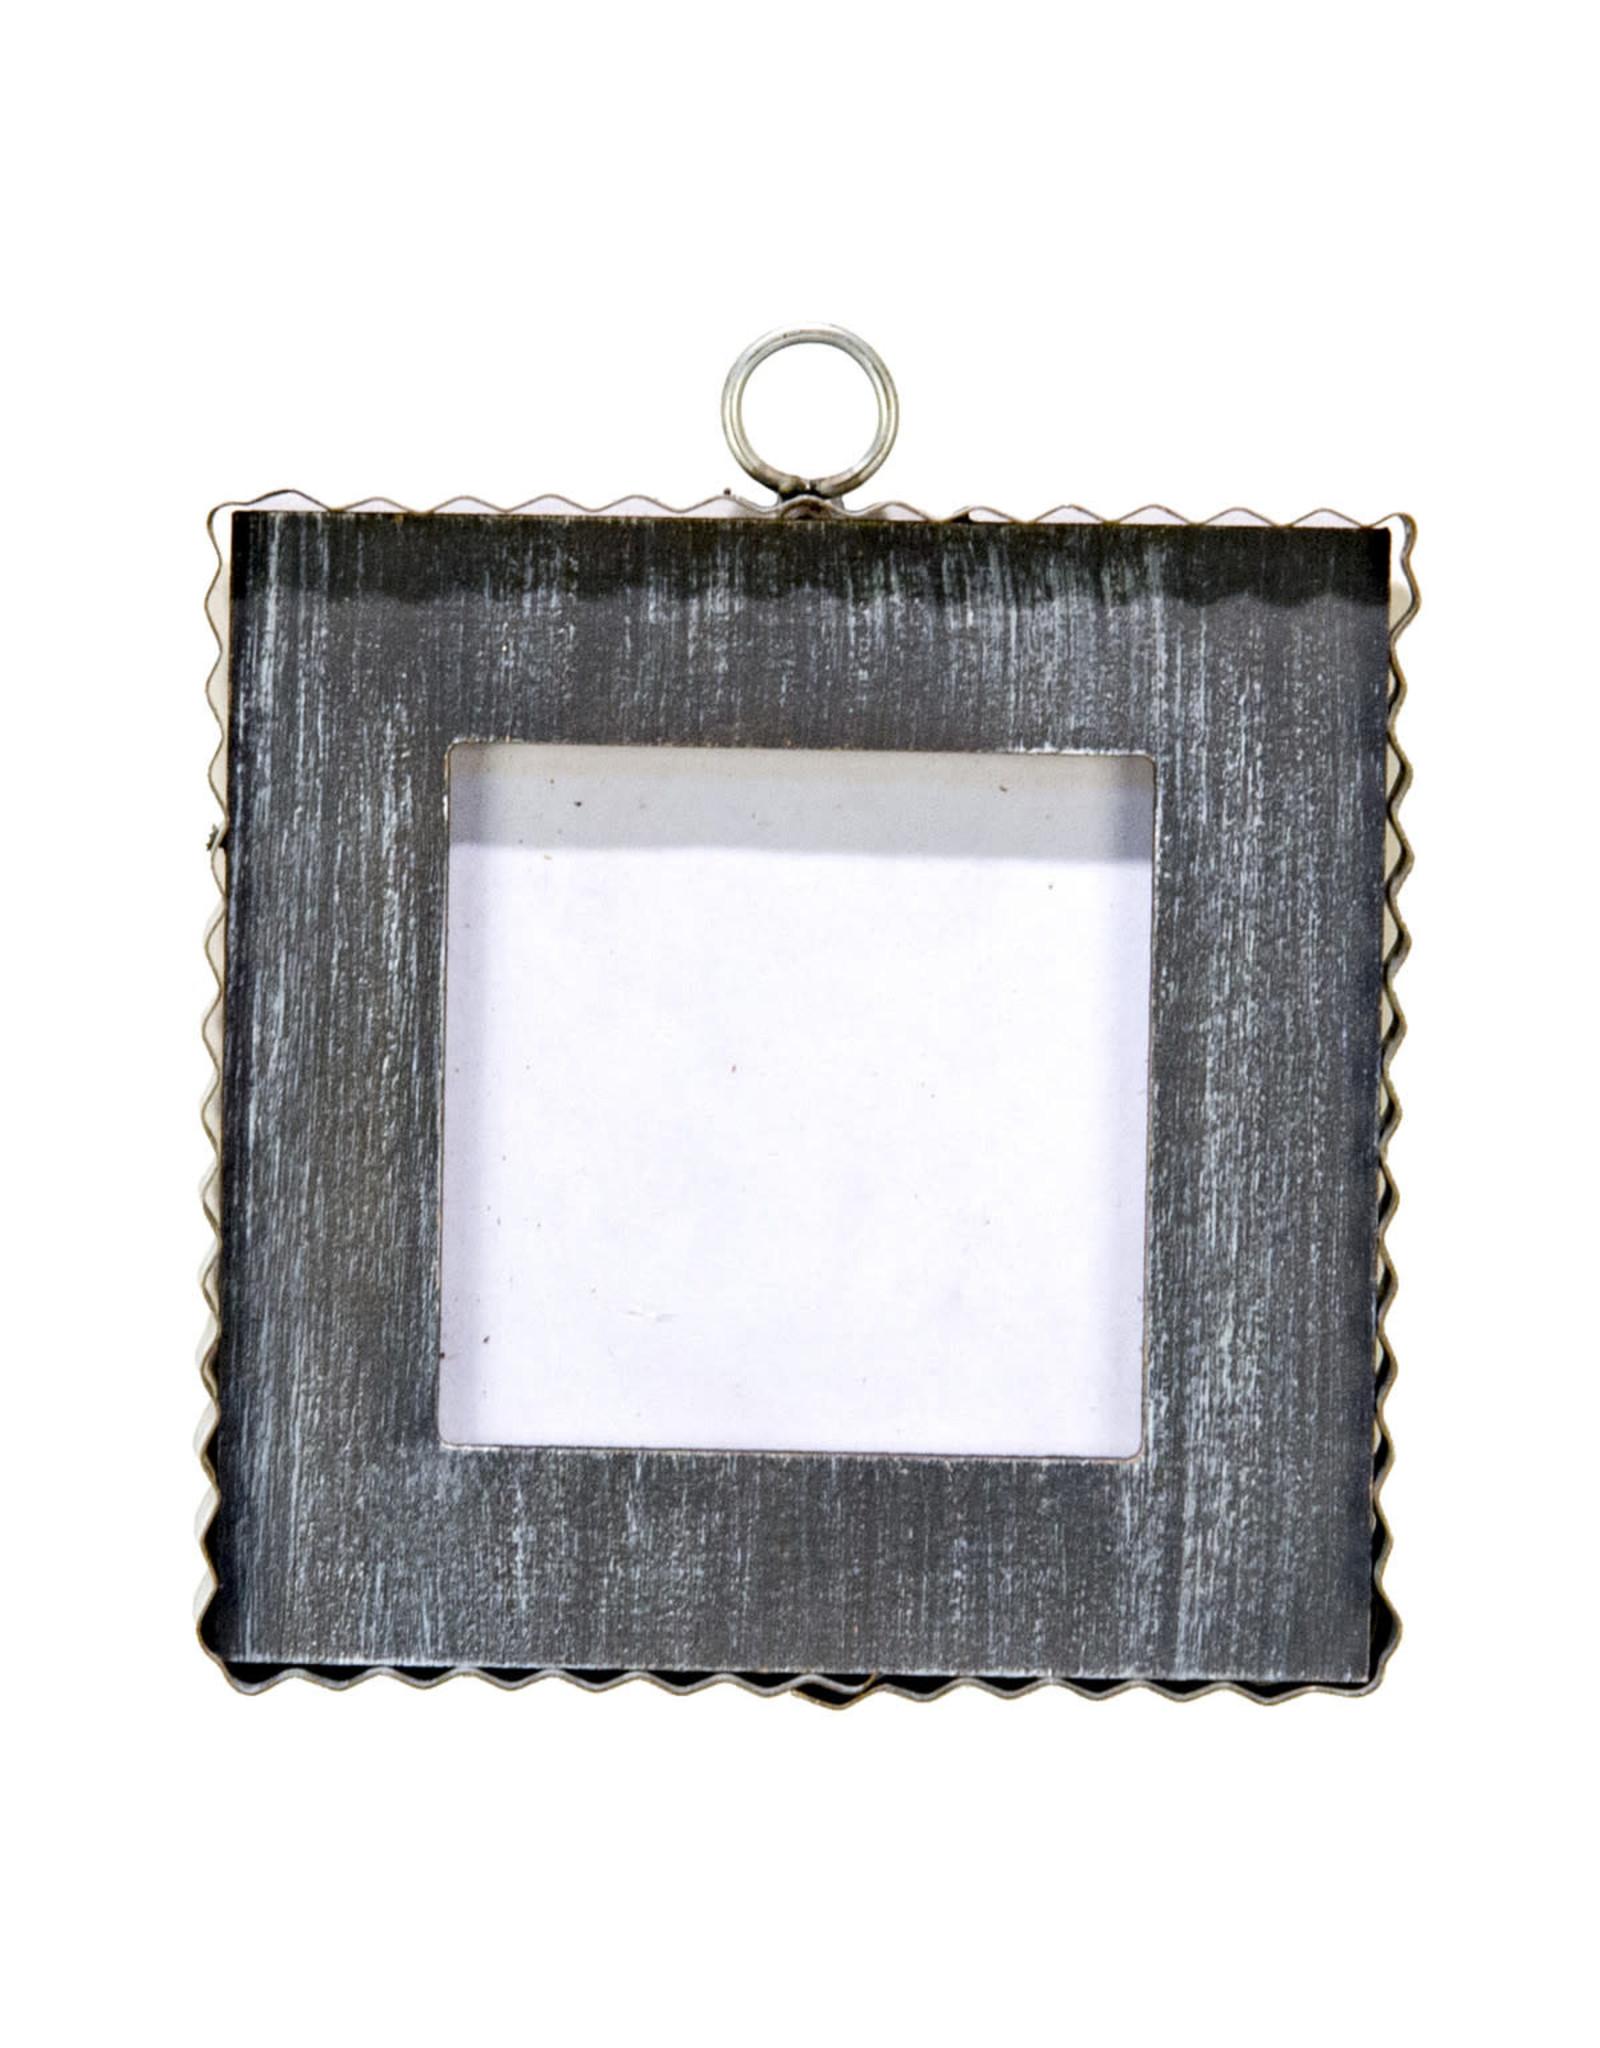 Mini Gallery Pie Crust Photo Frame Black Charm